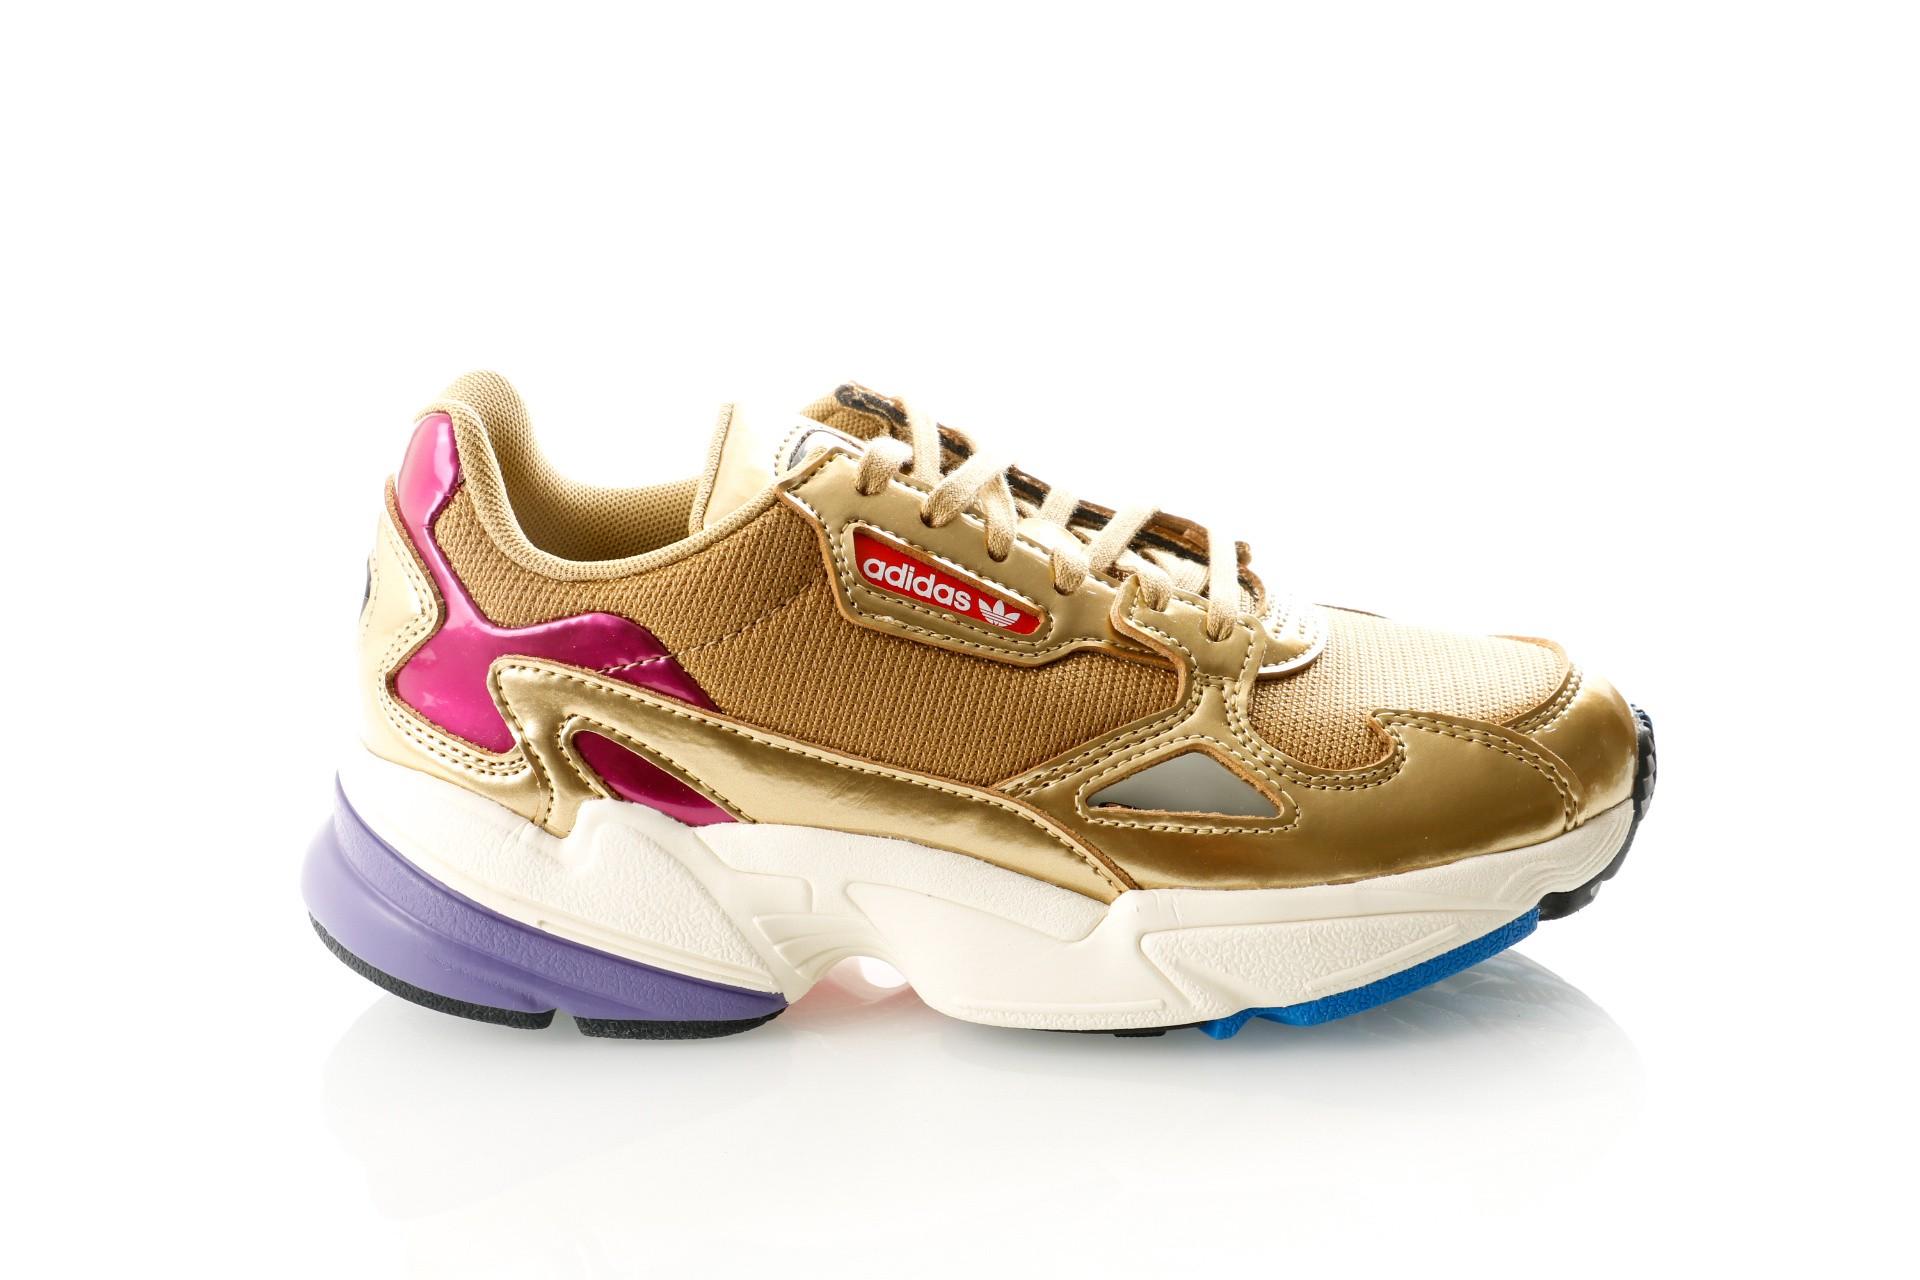 on sale 2b0cf bc4d7 Afbeelding van Adidas FALCON W CG6247 Sneakers gold met.gold met.off